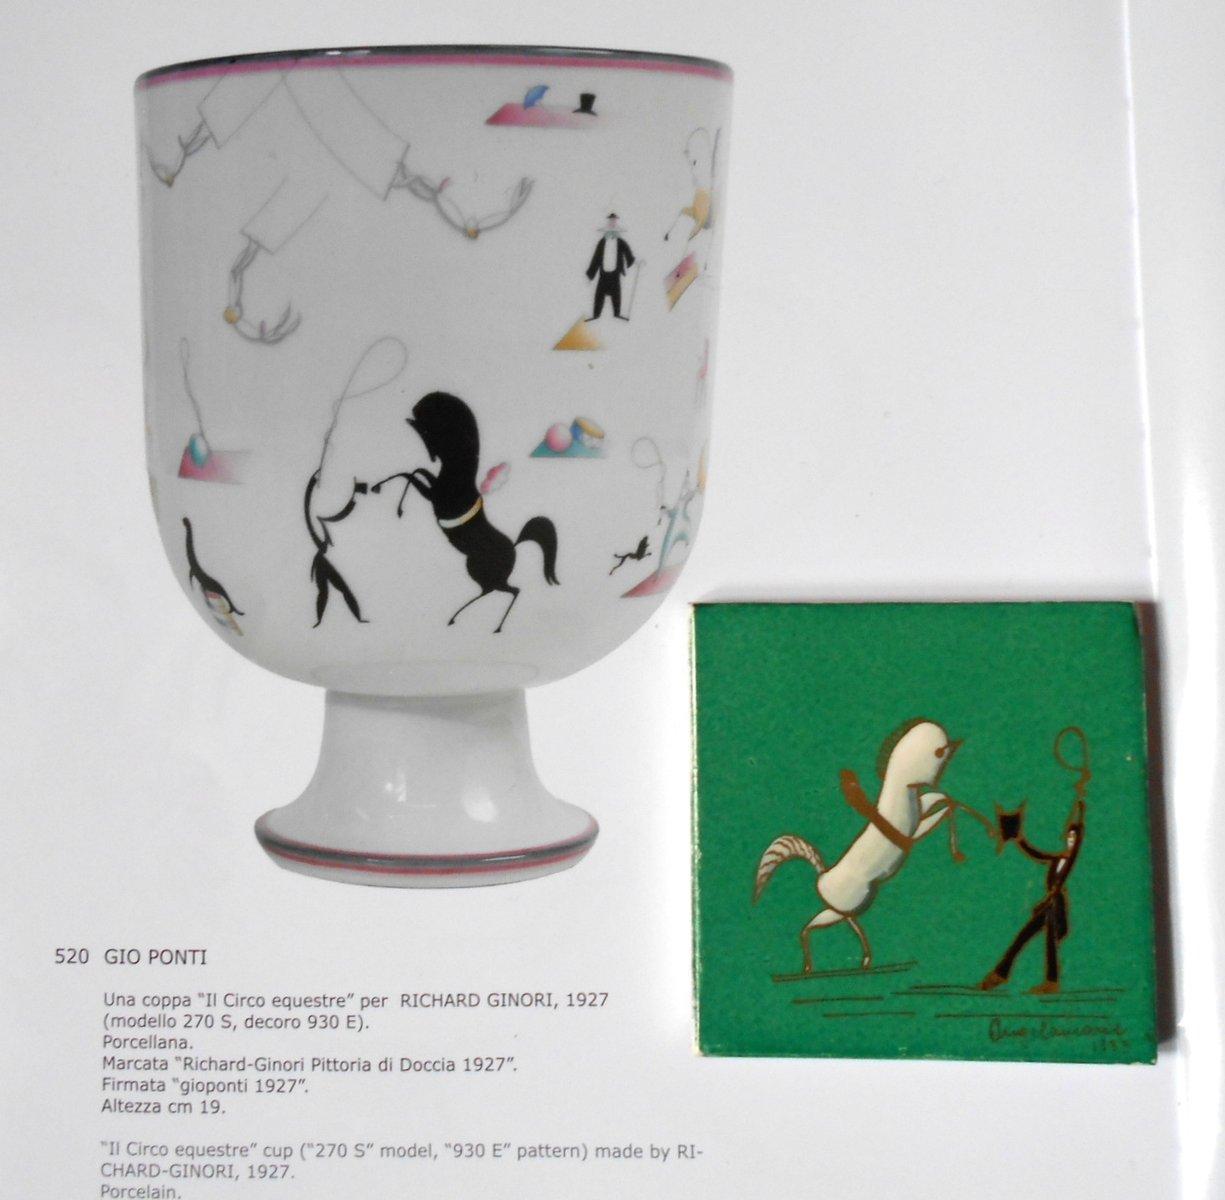 Art deco ceramic tile by gio ponti for richard ginori 1933 for price 66900 regular price 71800 dailygadgetfo Images